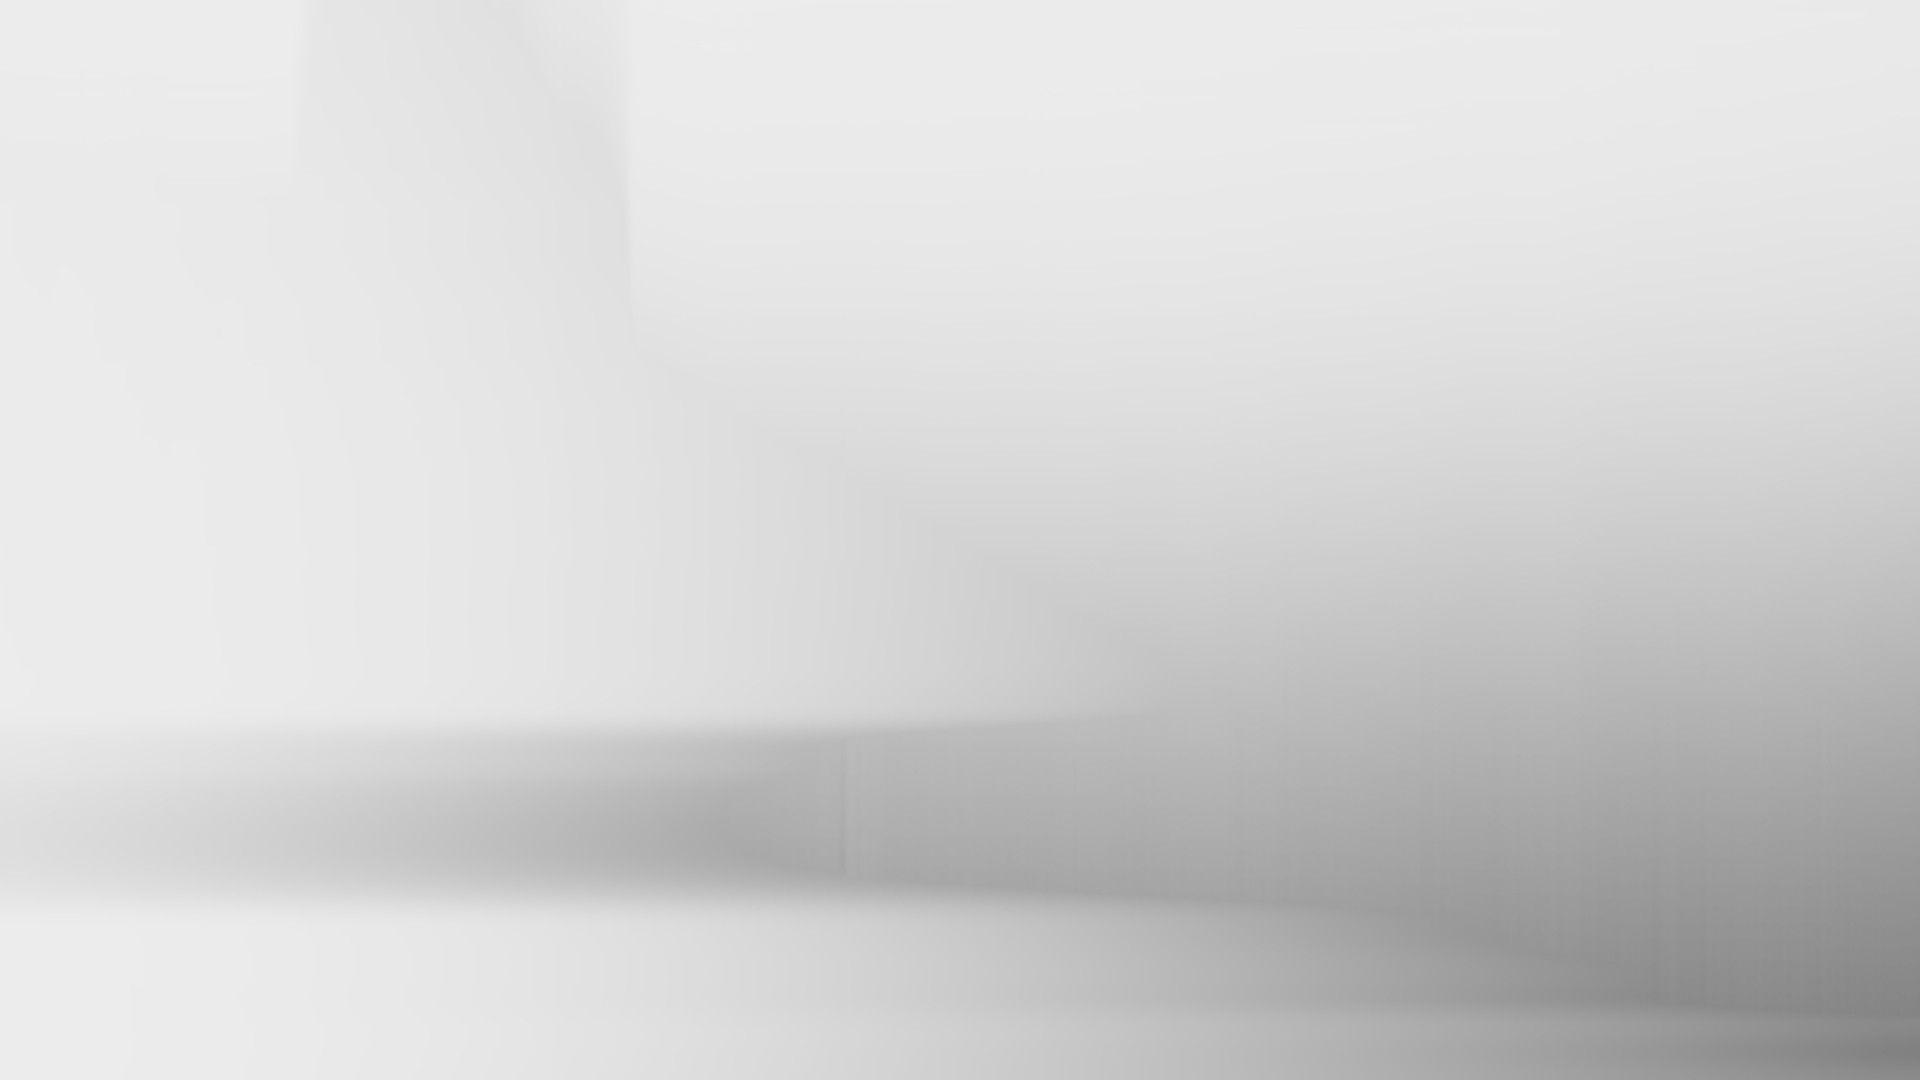 White desktop backgrounds wallpaper cave for Black and silver 3d wallpaper